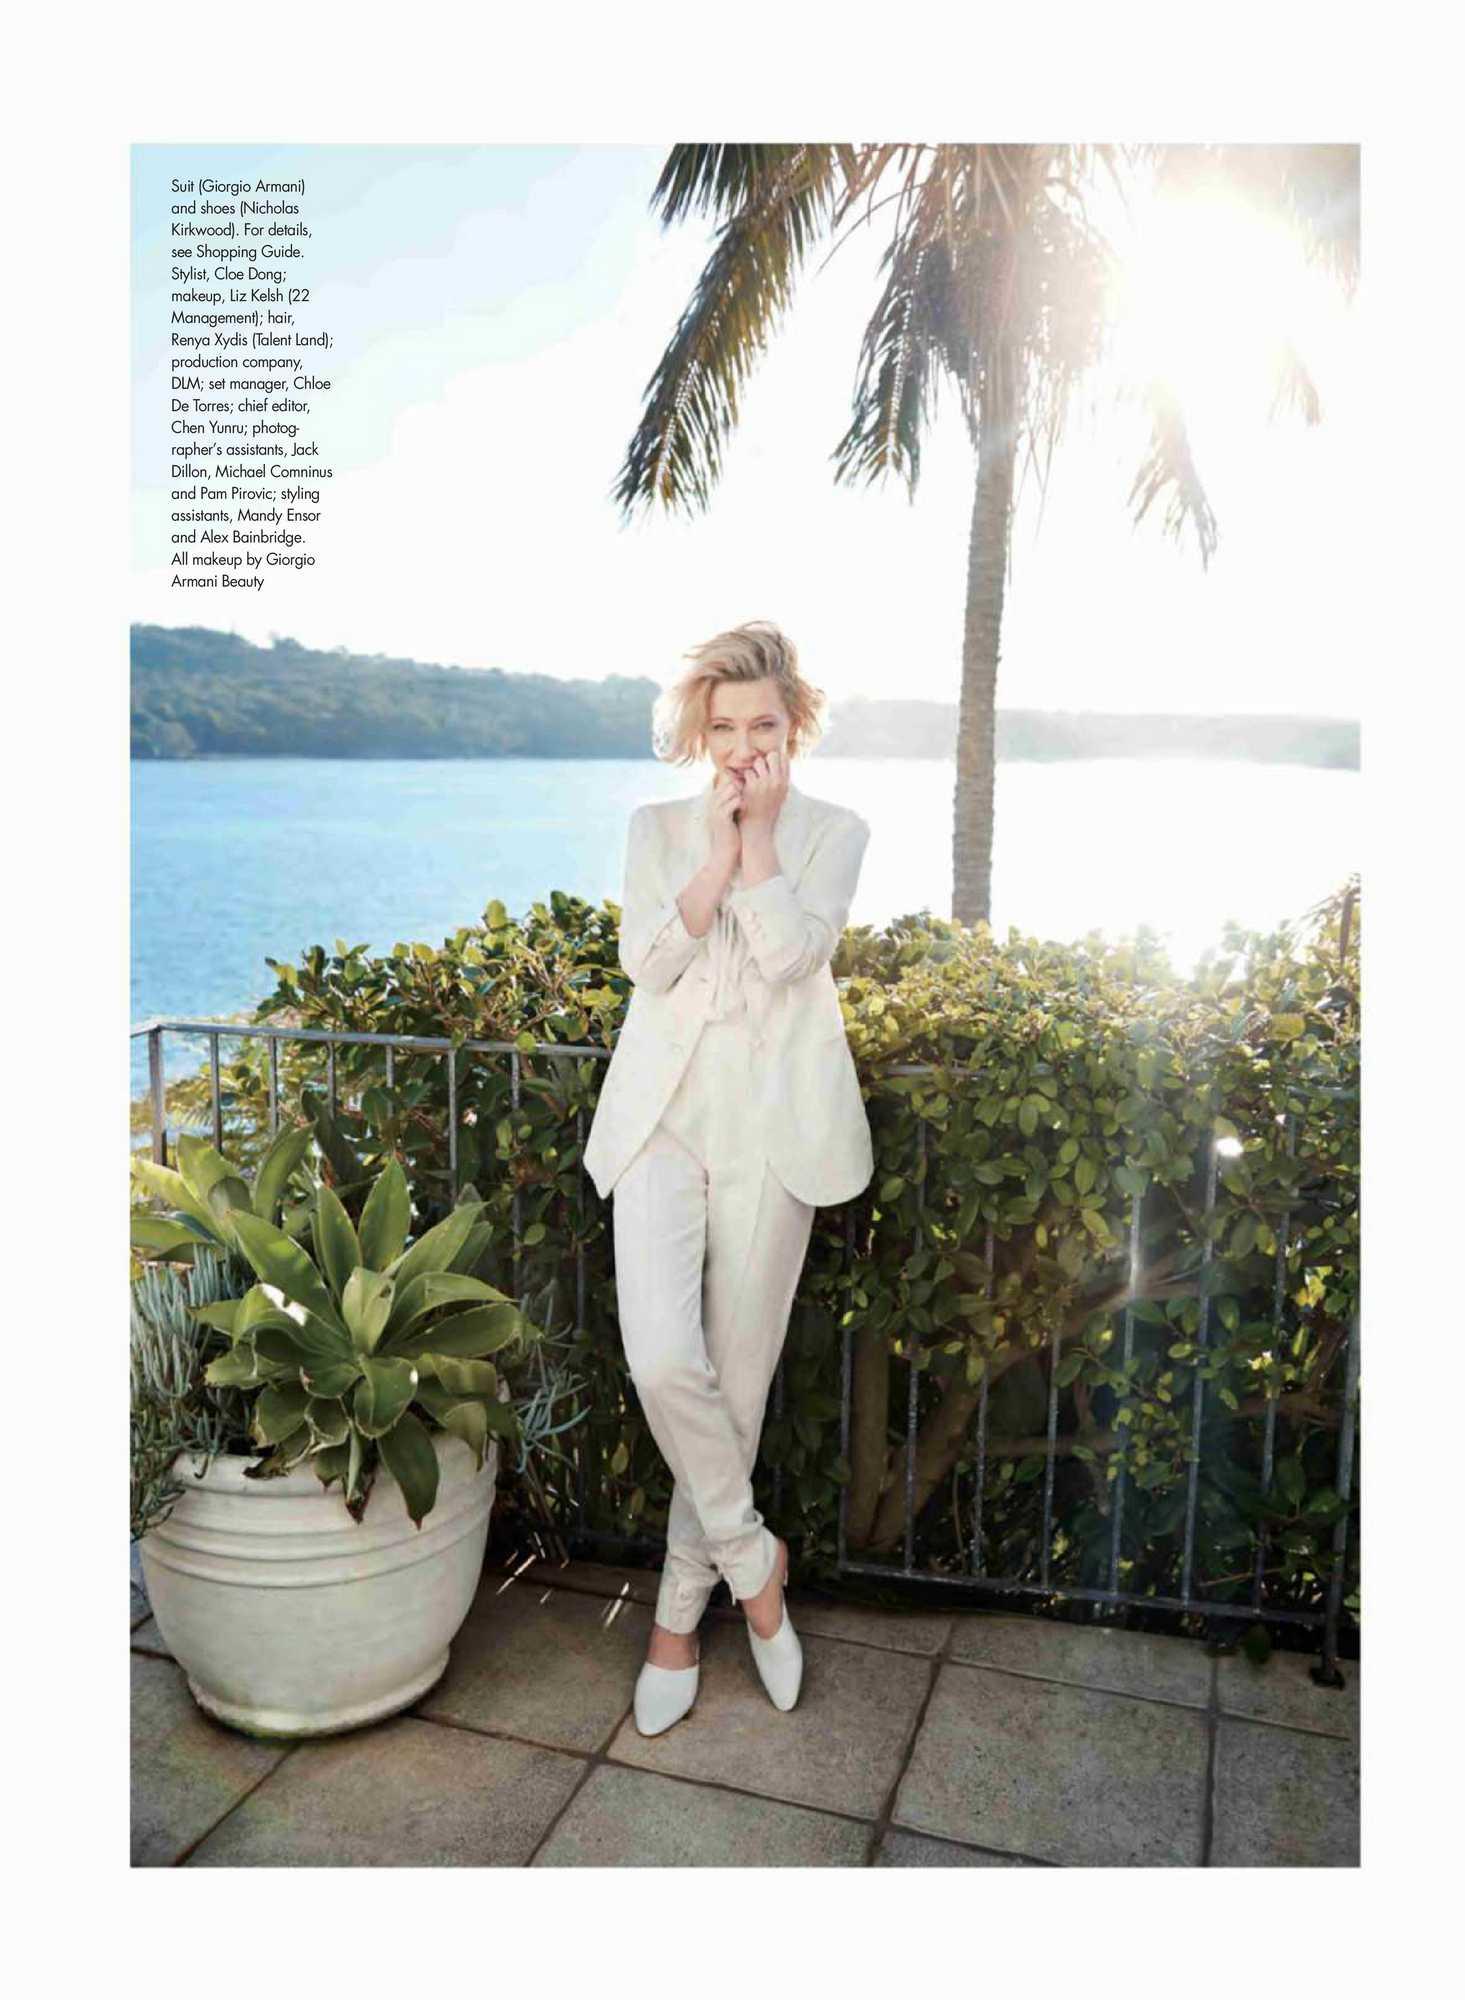 Cate-Blanchett-Elle-Canada-December-2018a4ffe61024006364.jpg